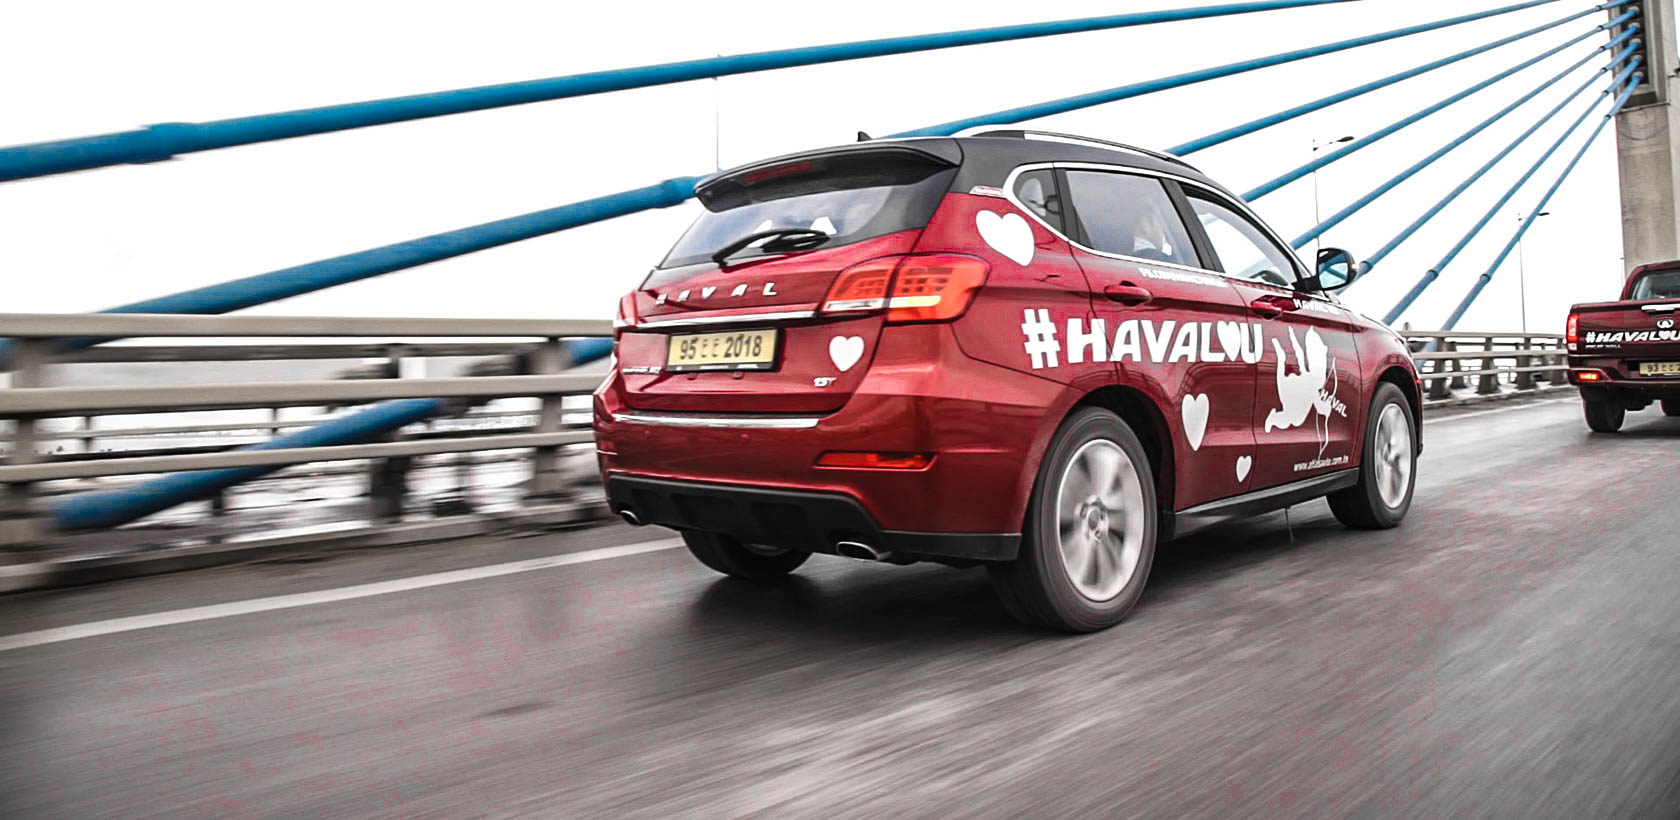 Atlas Auto lance sa campagne #HAVAL♥U